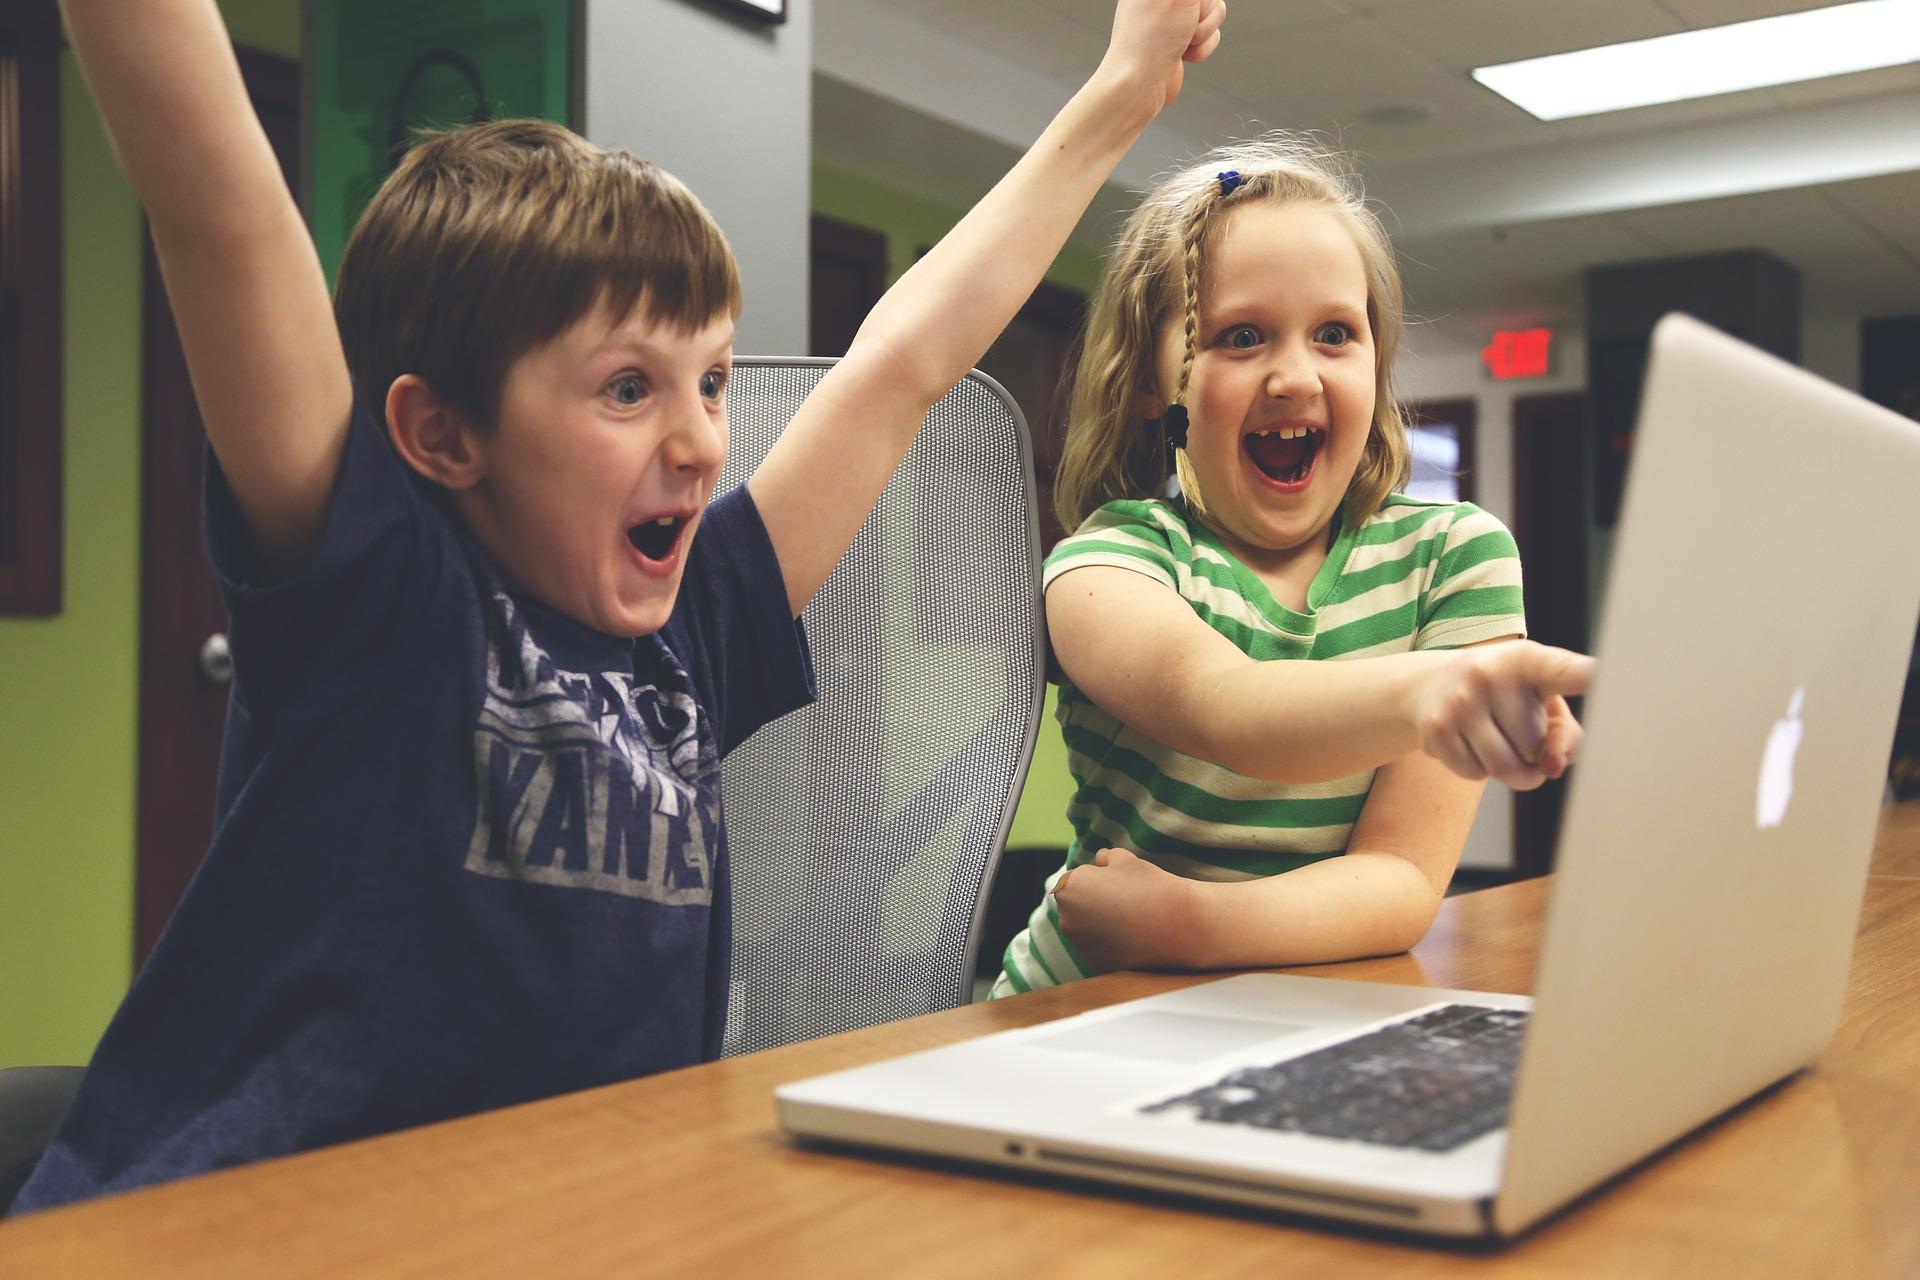 Most Popular Ecommerce platforms- children